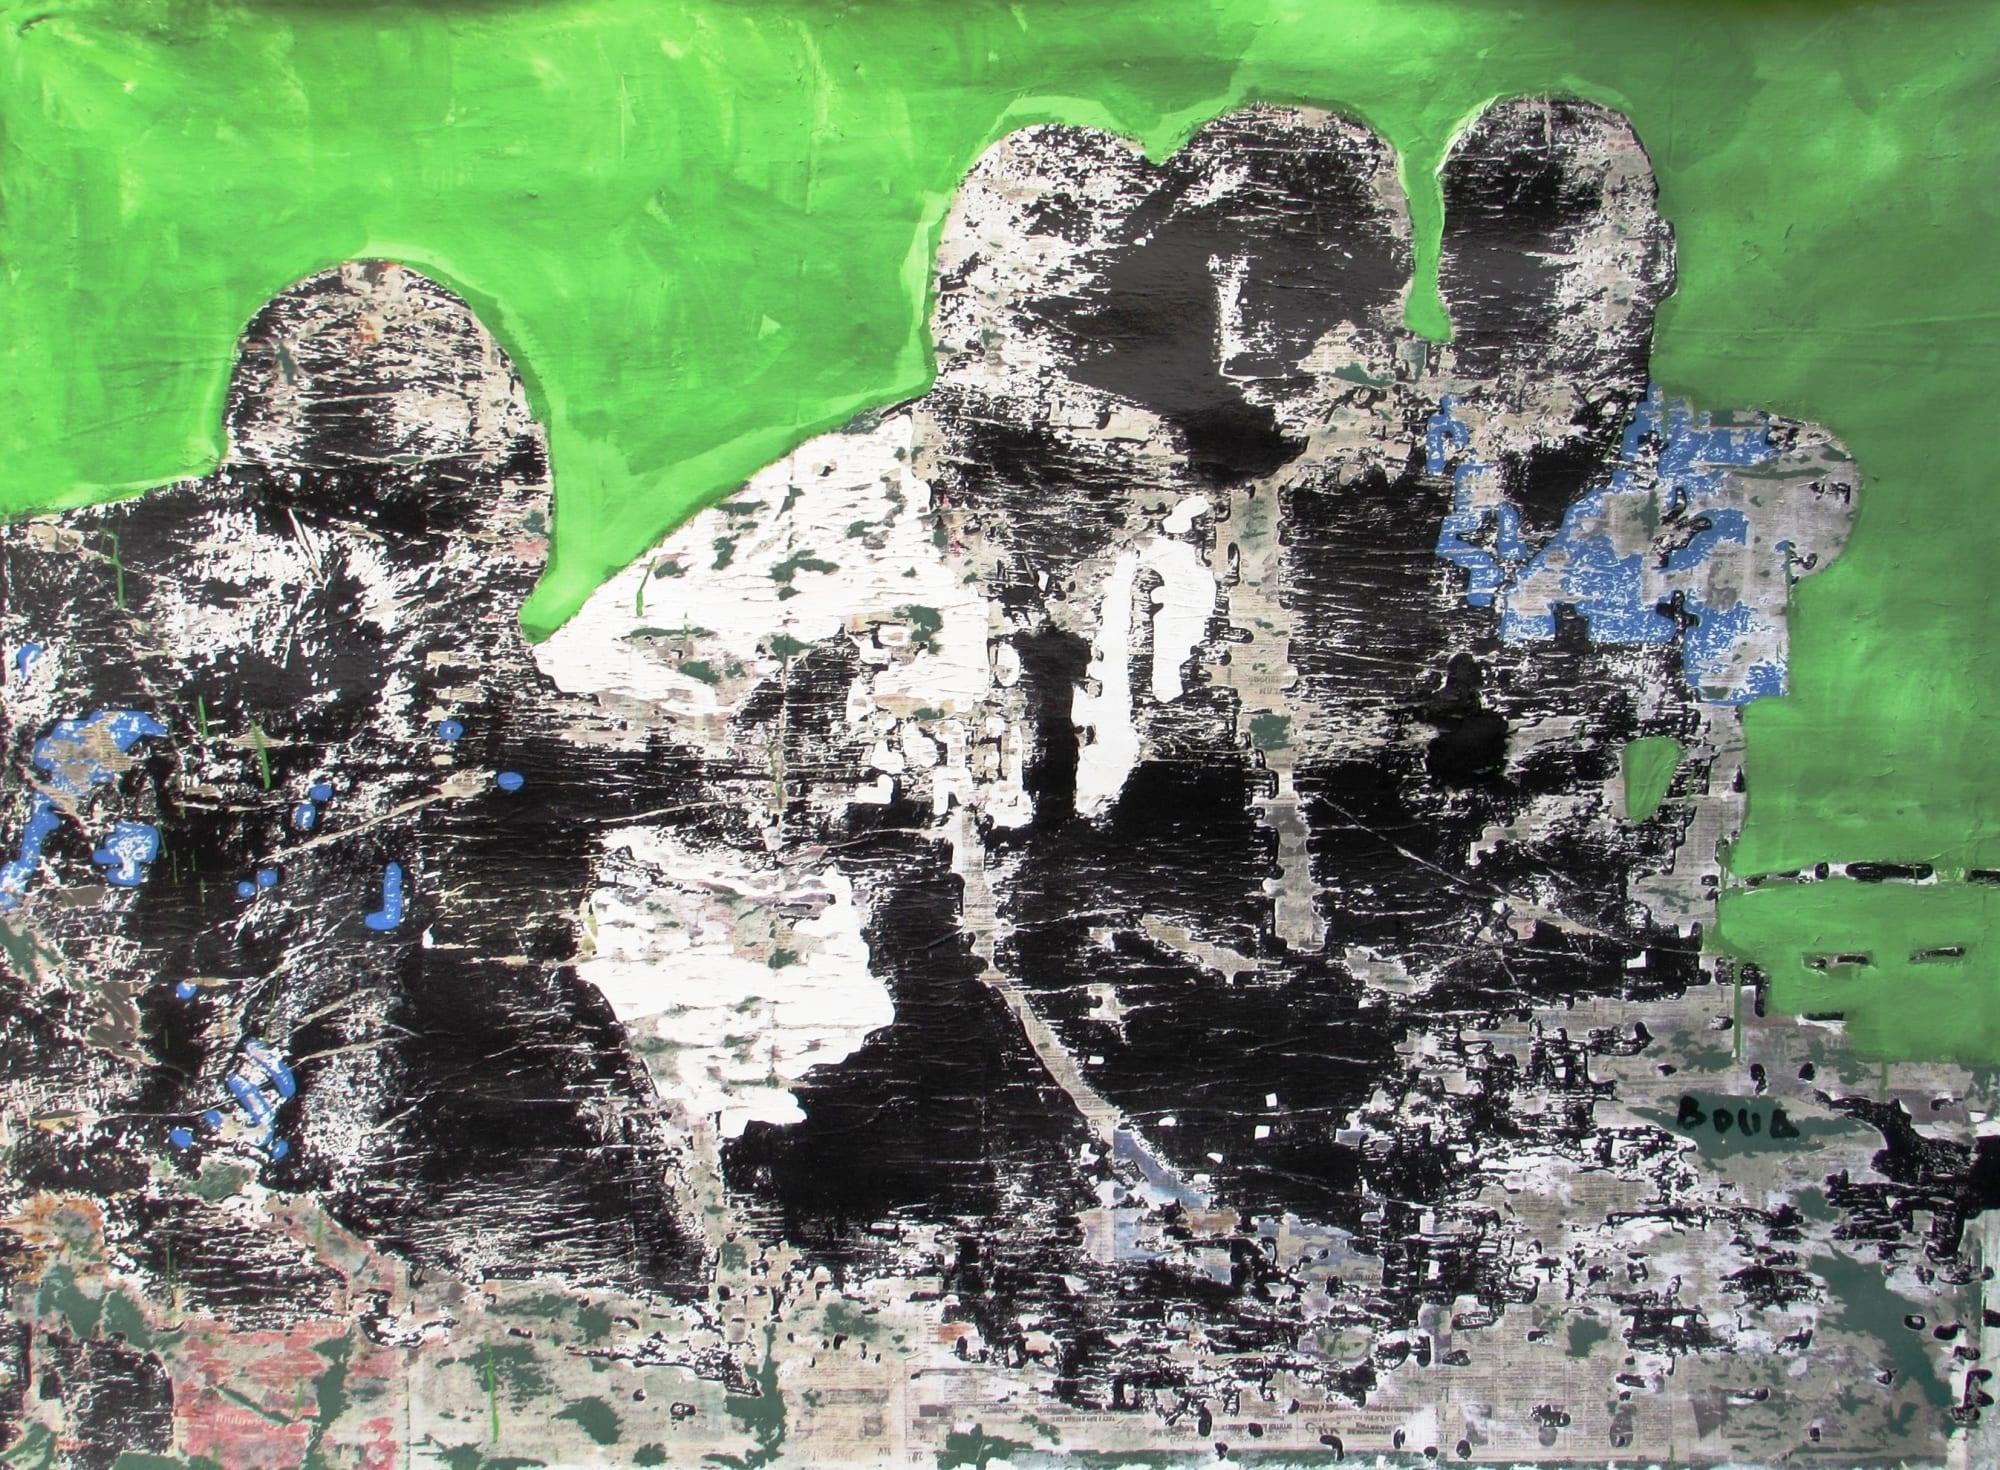 Armand Boua: Les Badès (Les amis)